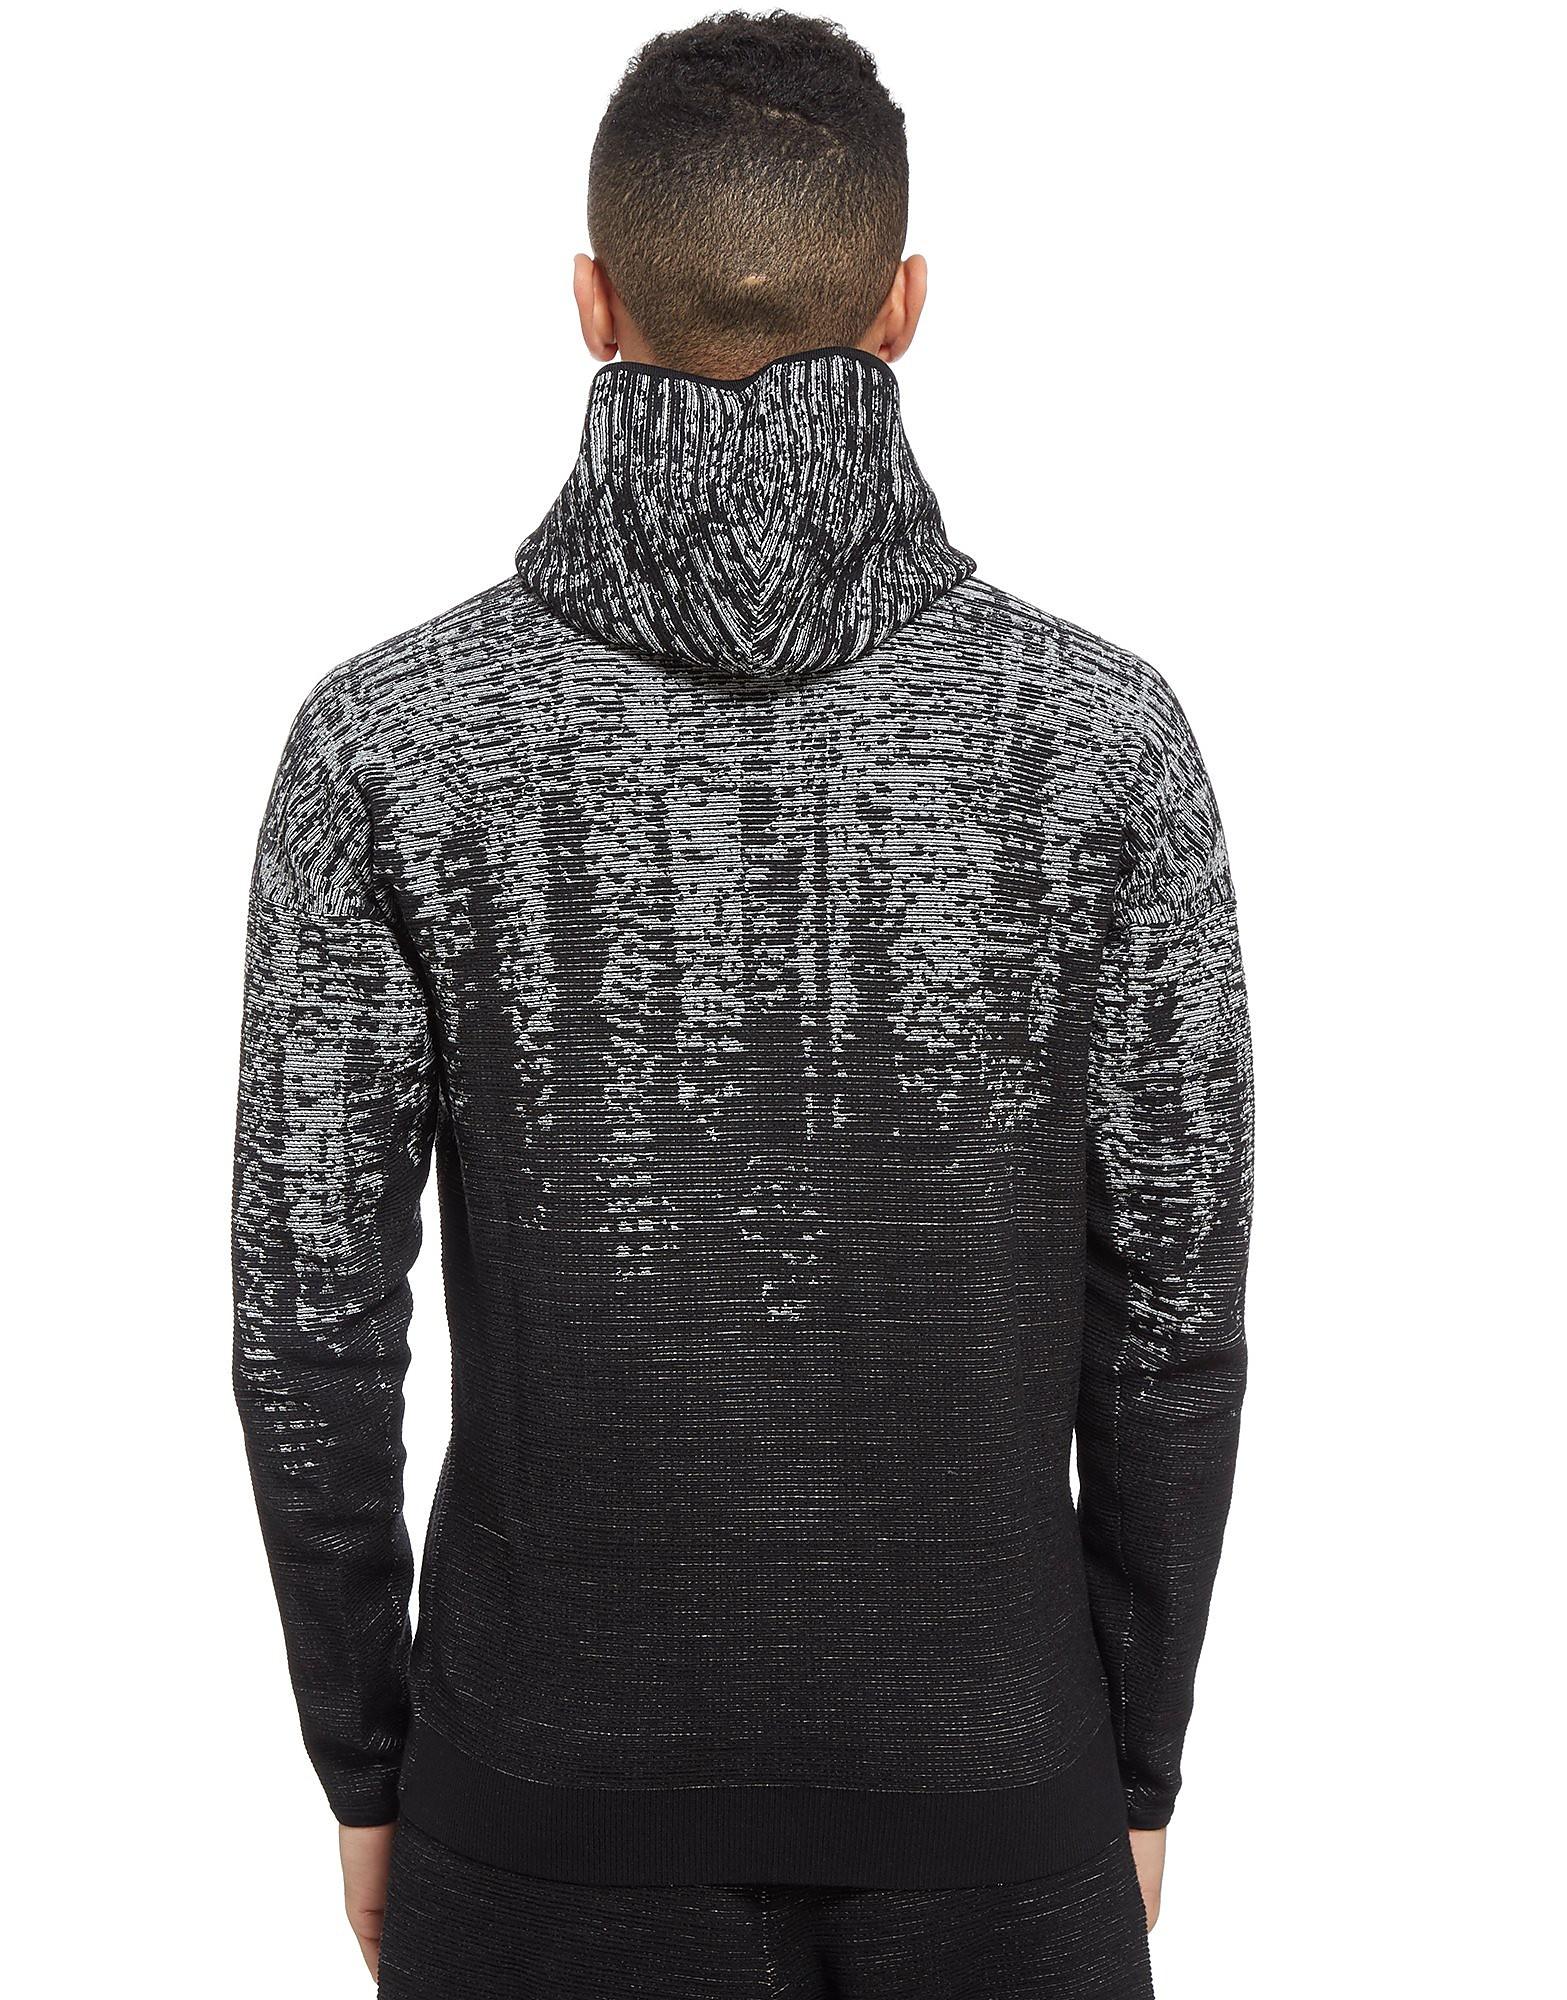 adidas Z.N.E. Pulse Knit Hoodie